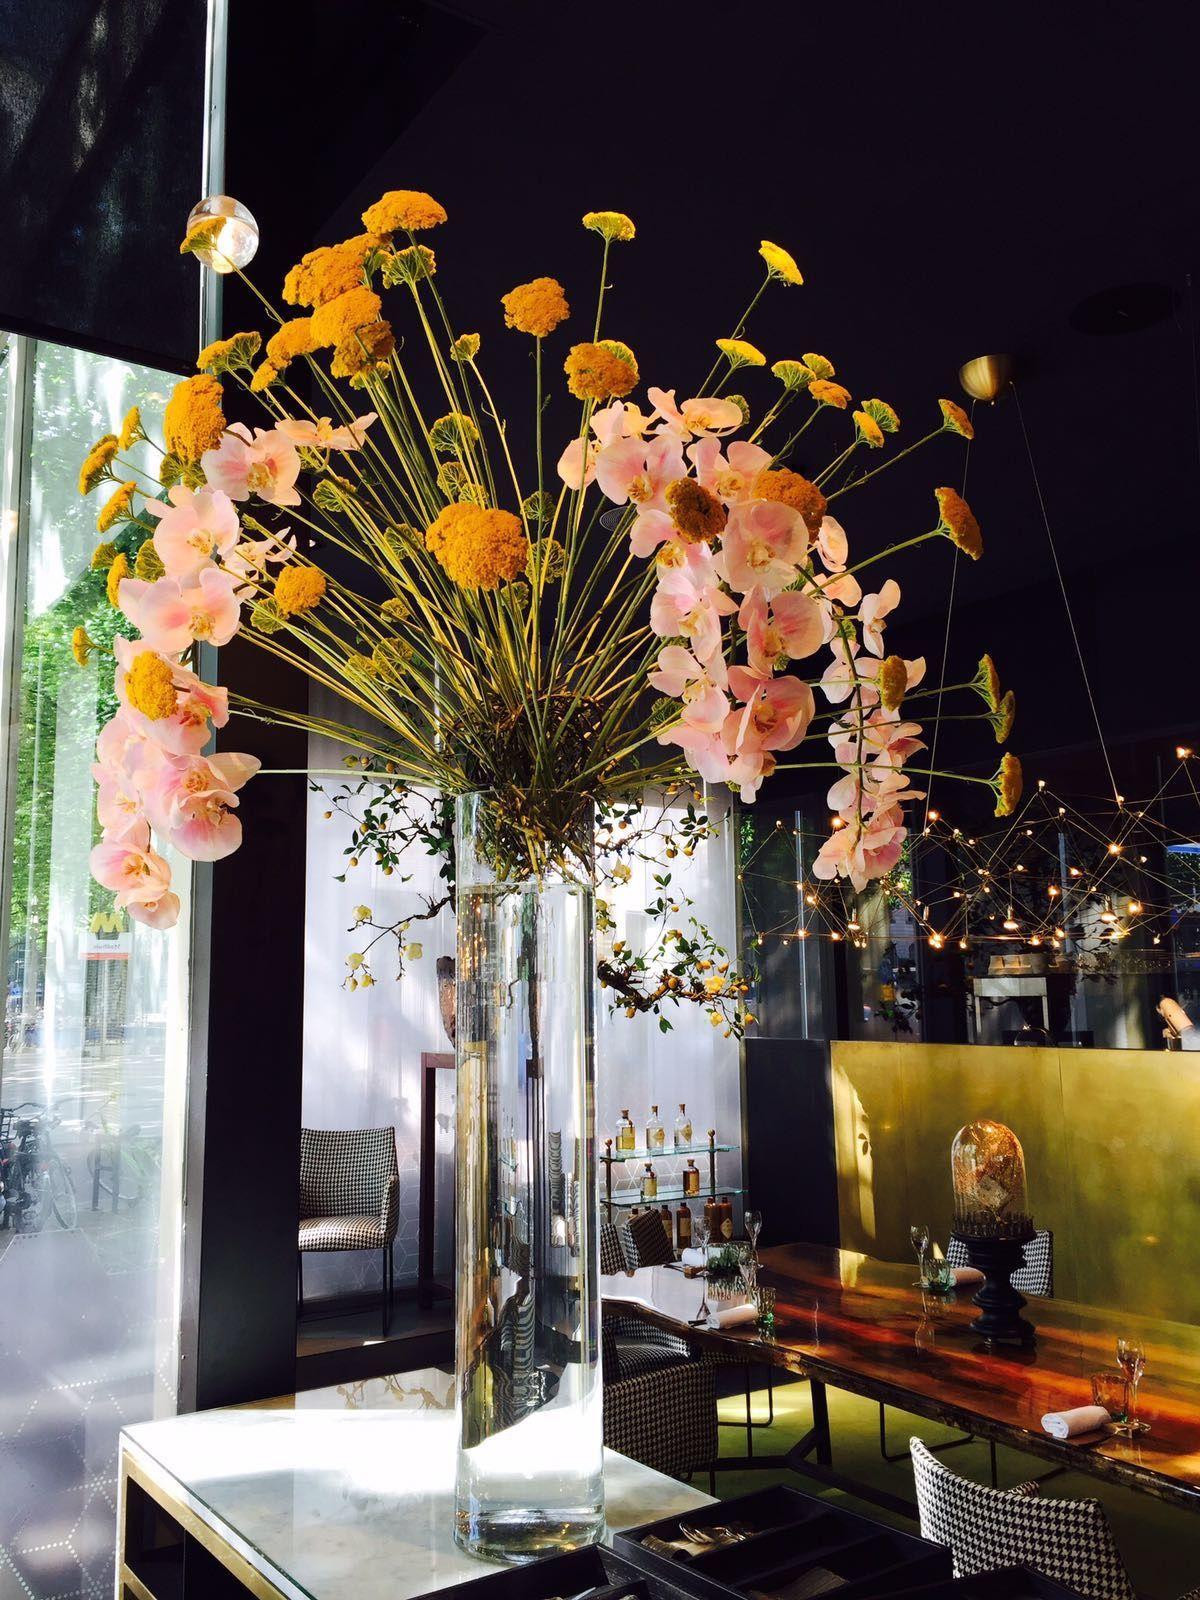 Joelia Restaurant Bloemen Flowers Flower Zomersbloemen Styling Restaurant Interieur Bloemen Restaurant